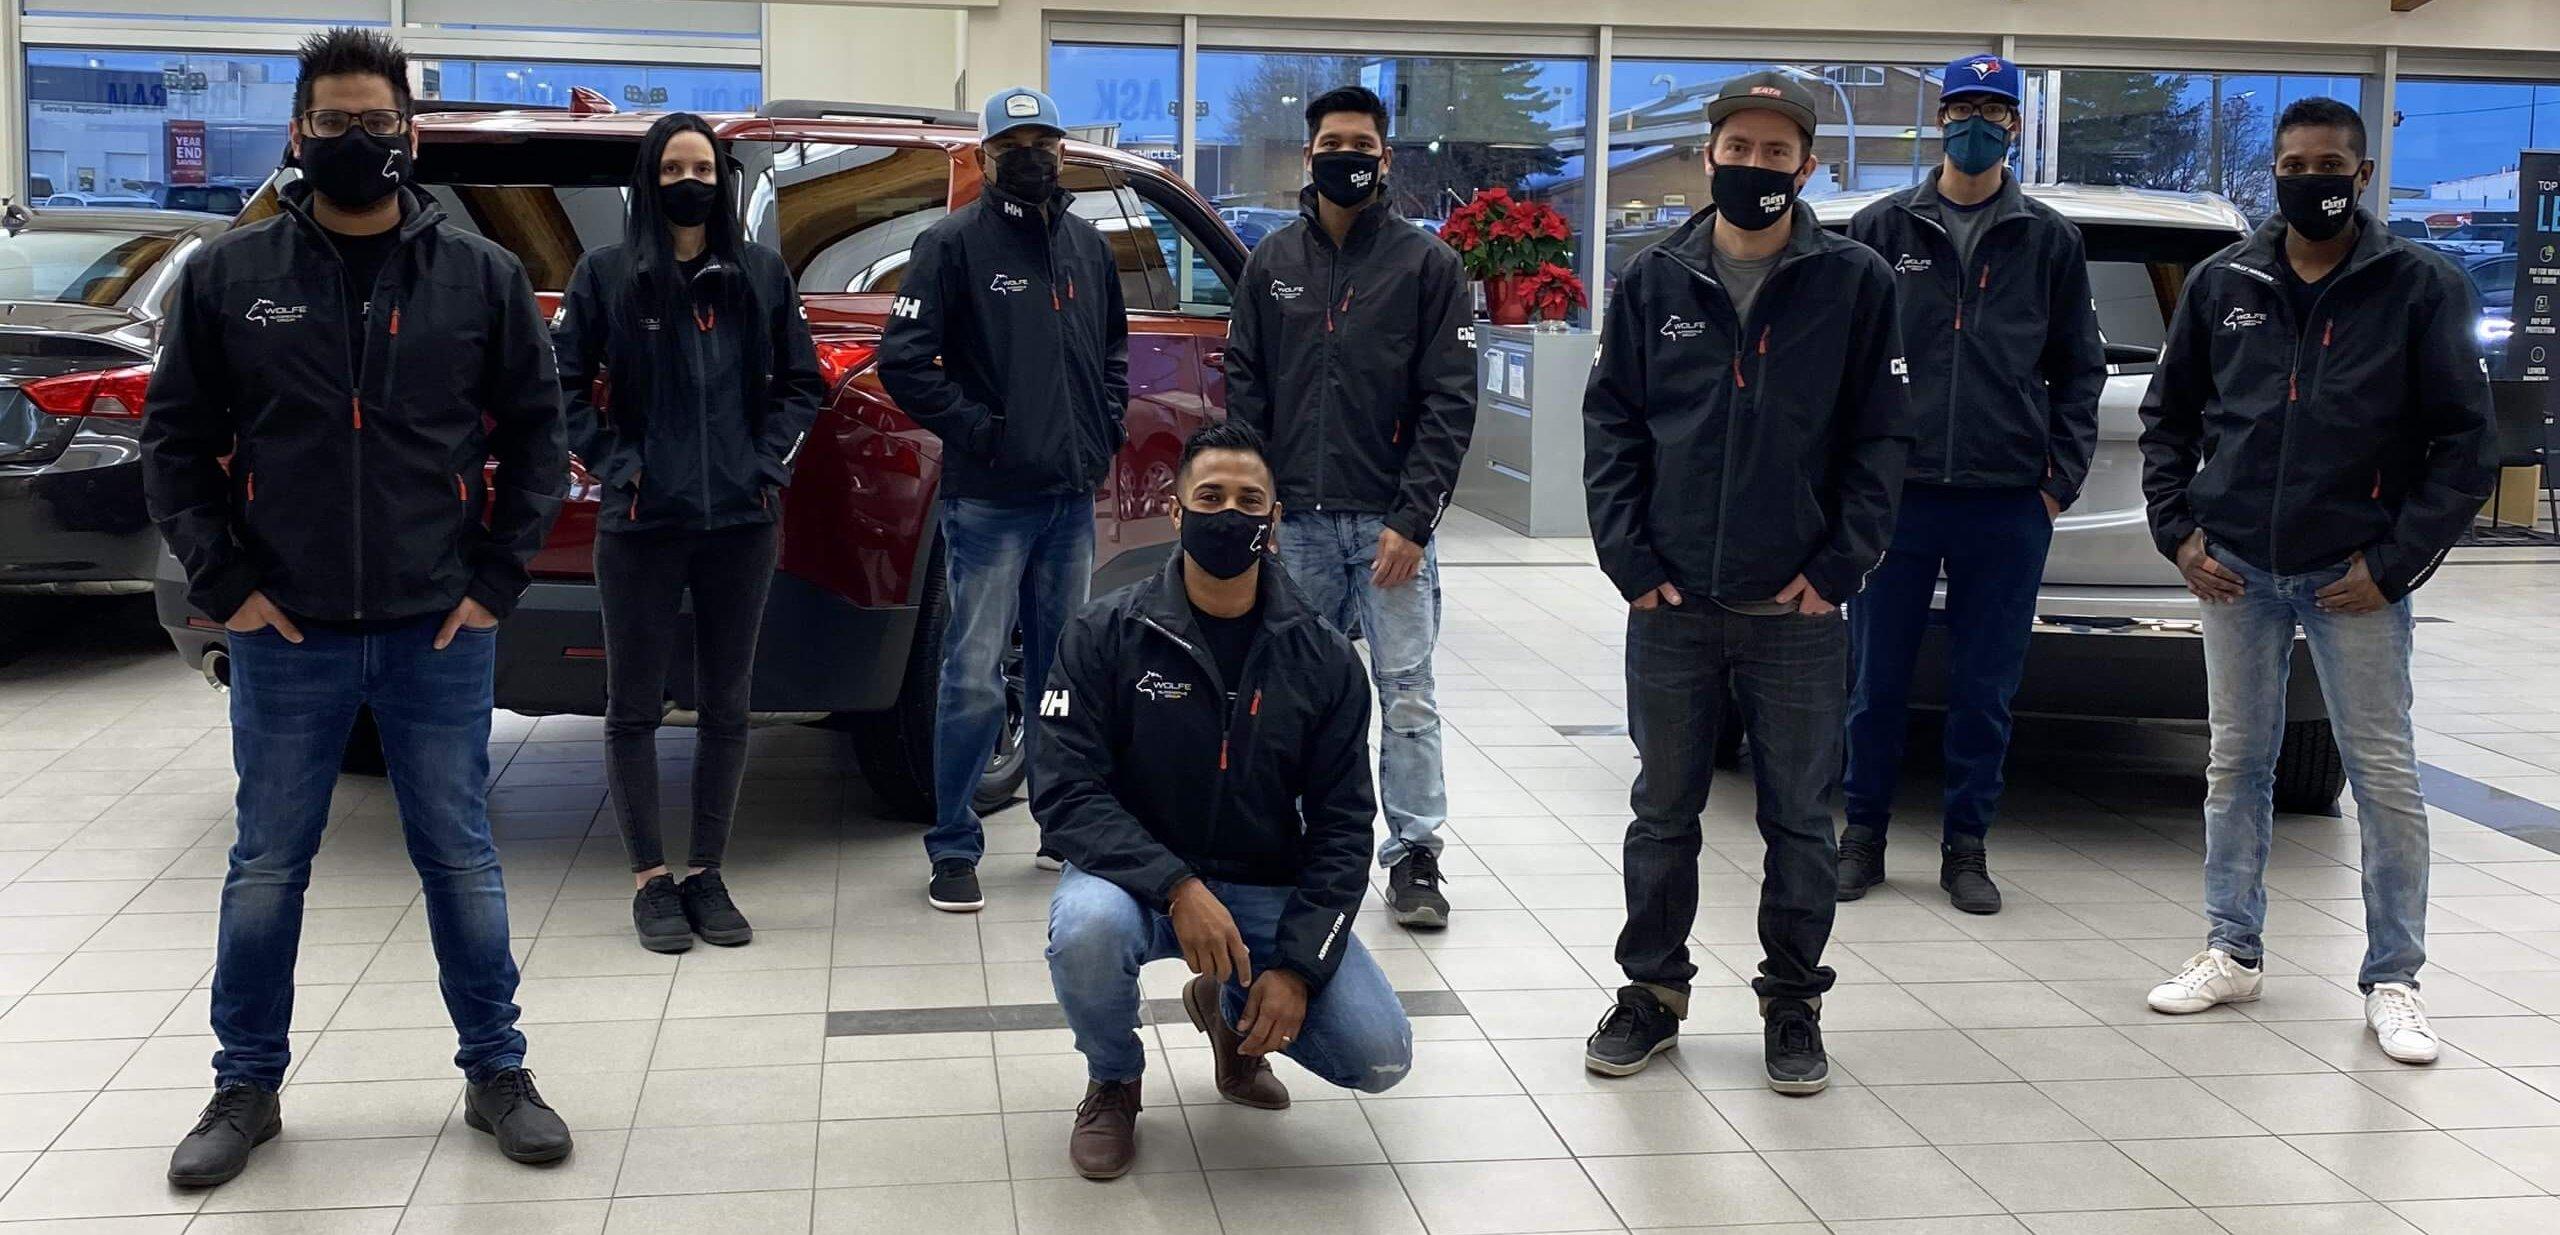 Westgate Body Shop team